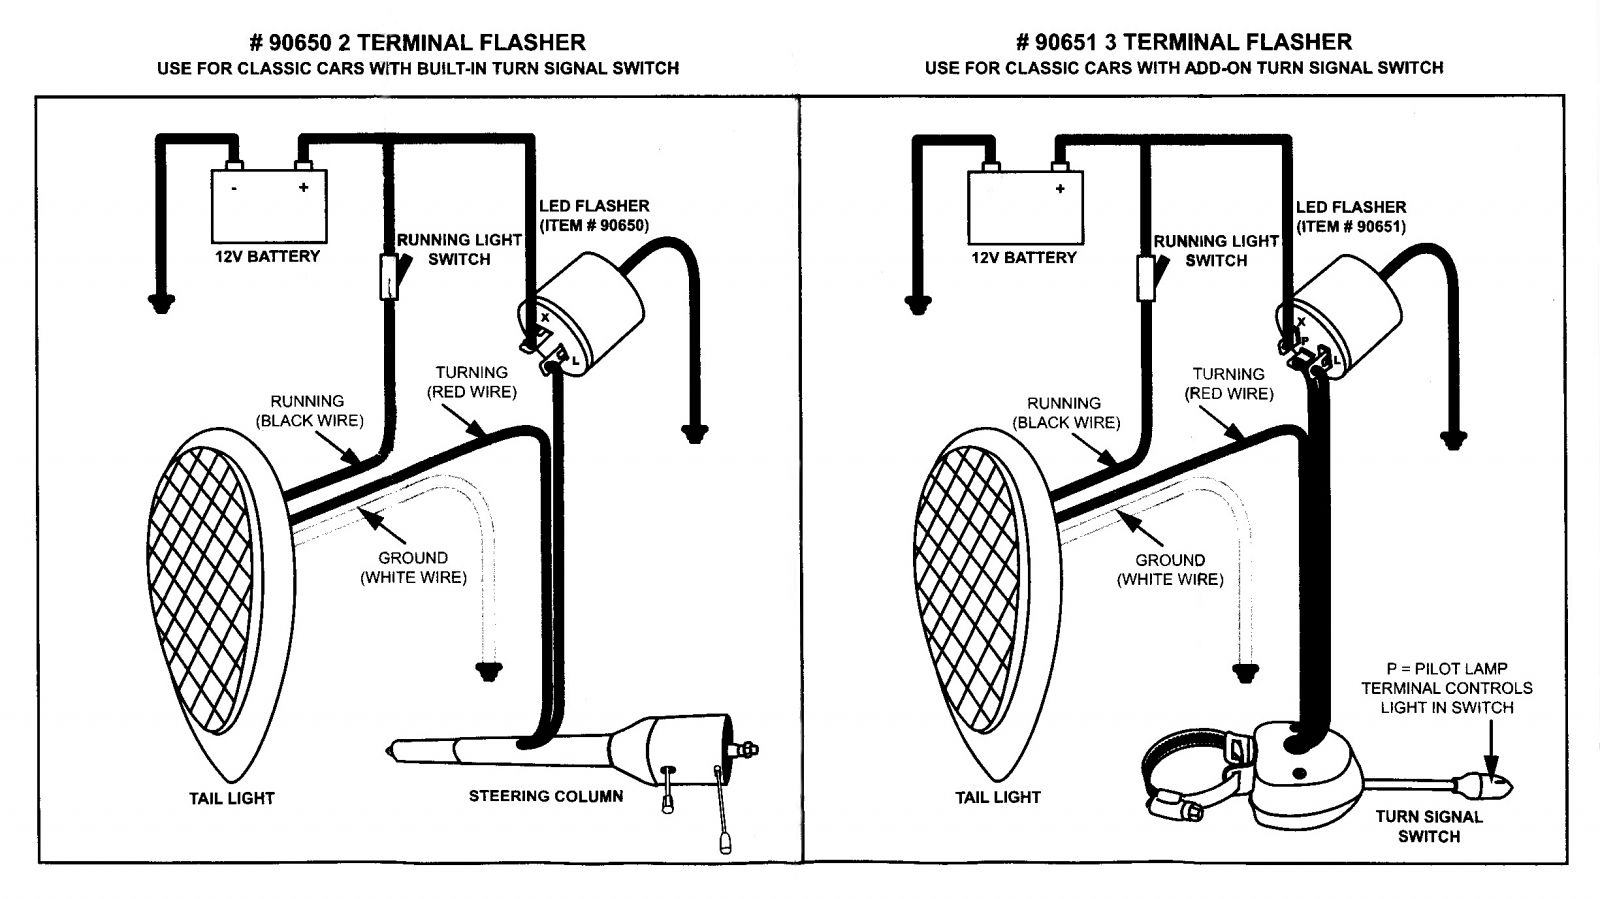 led tailights hotrod hotline led panel diagram